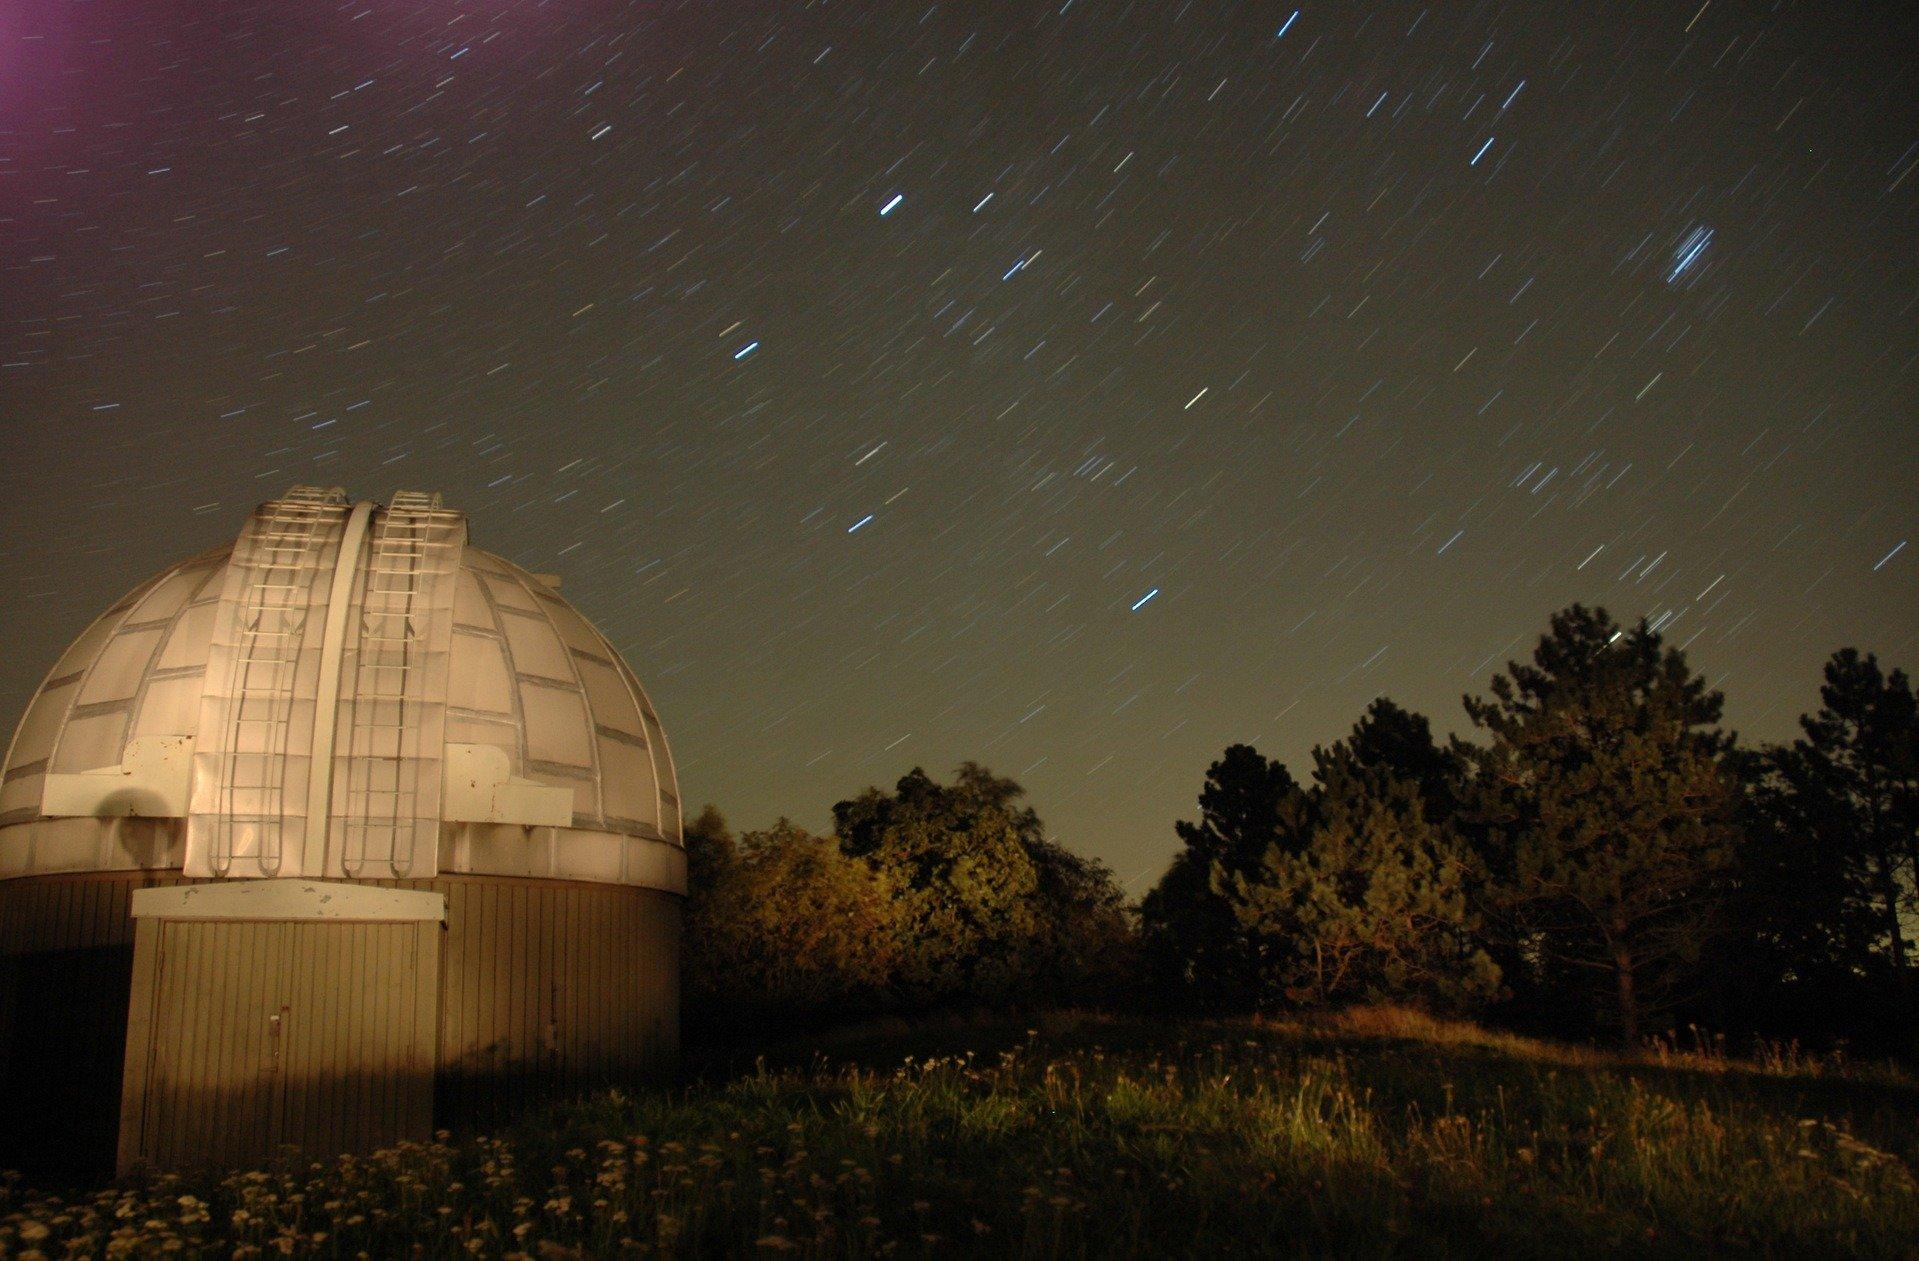 August night sky